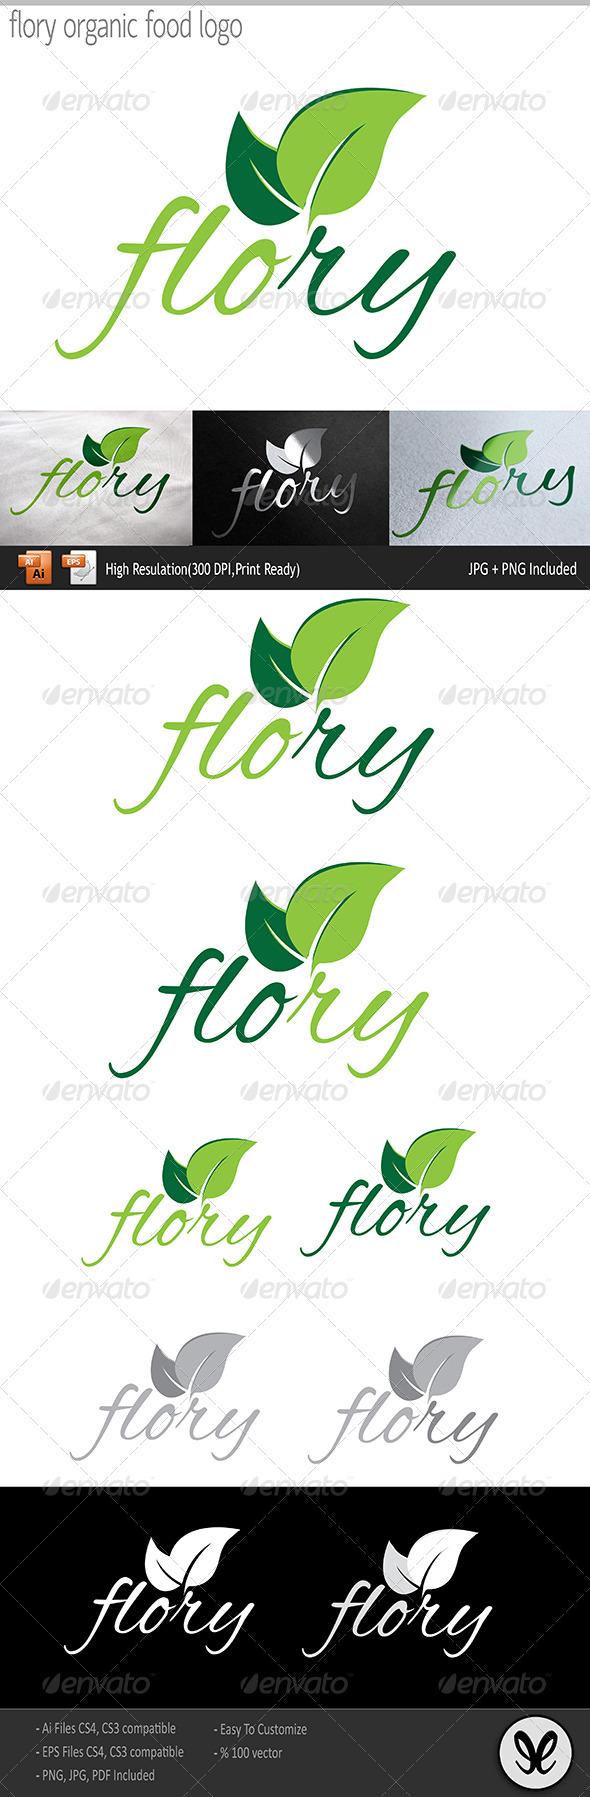 GraphicRiver Flory Organic Food Logo 3551569